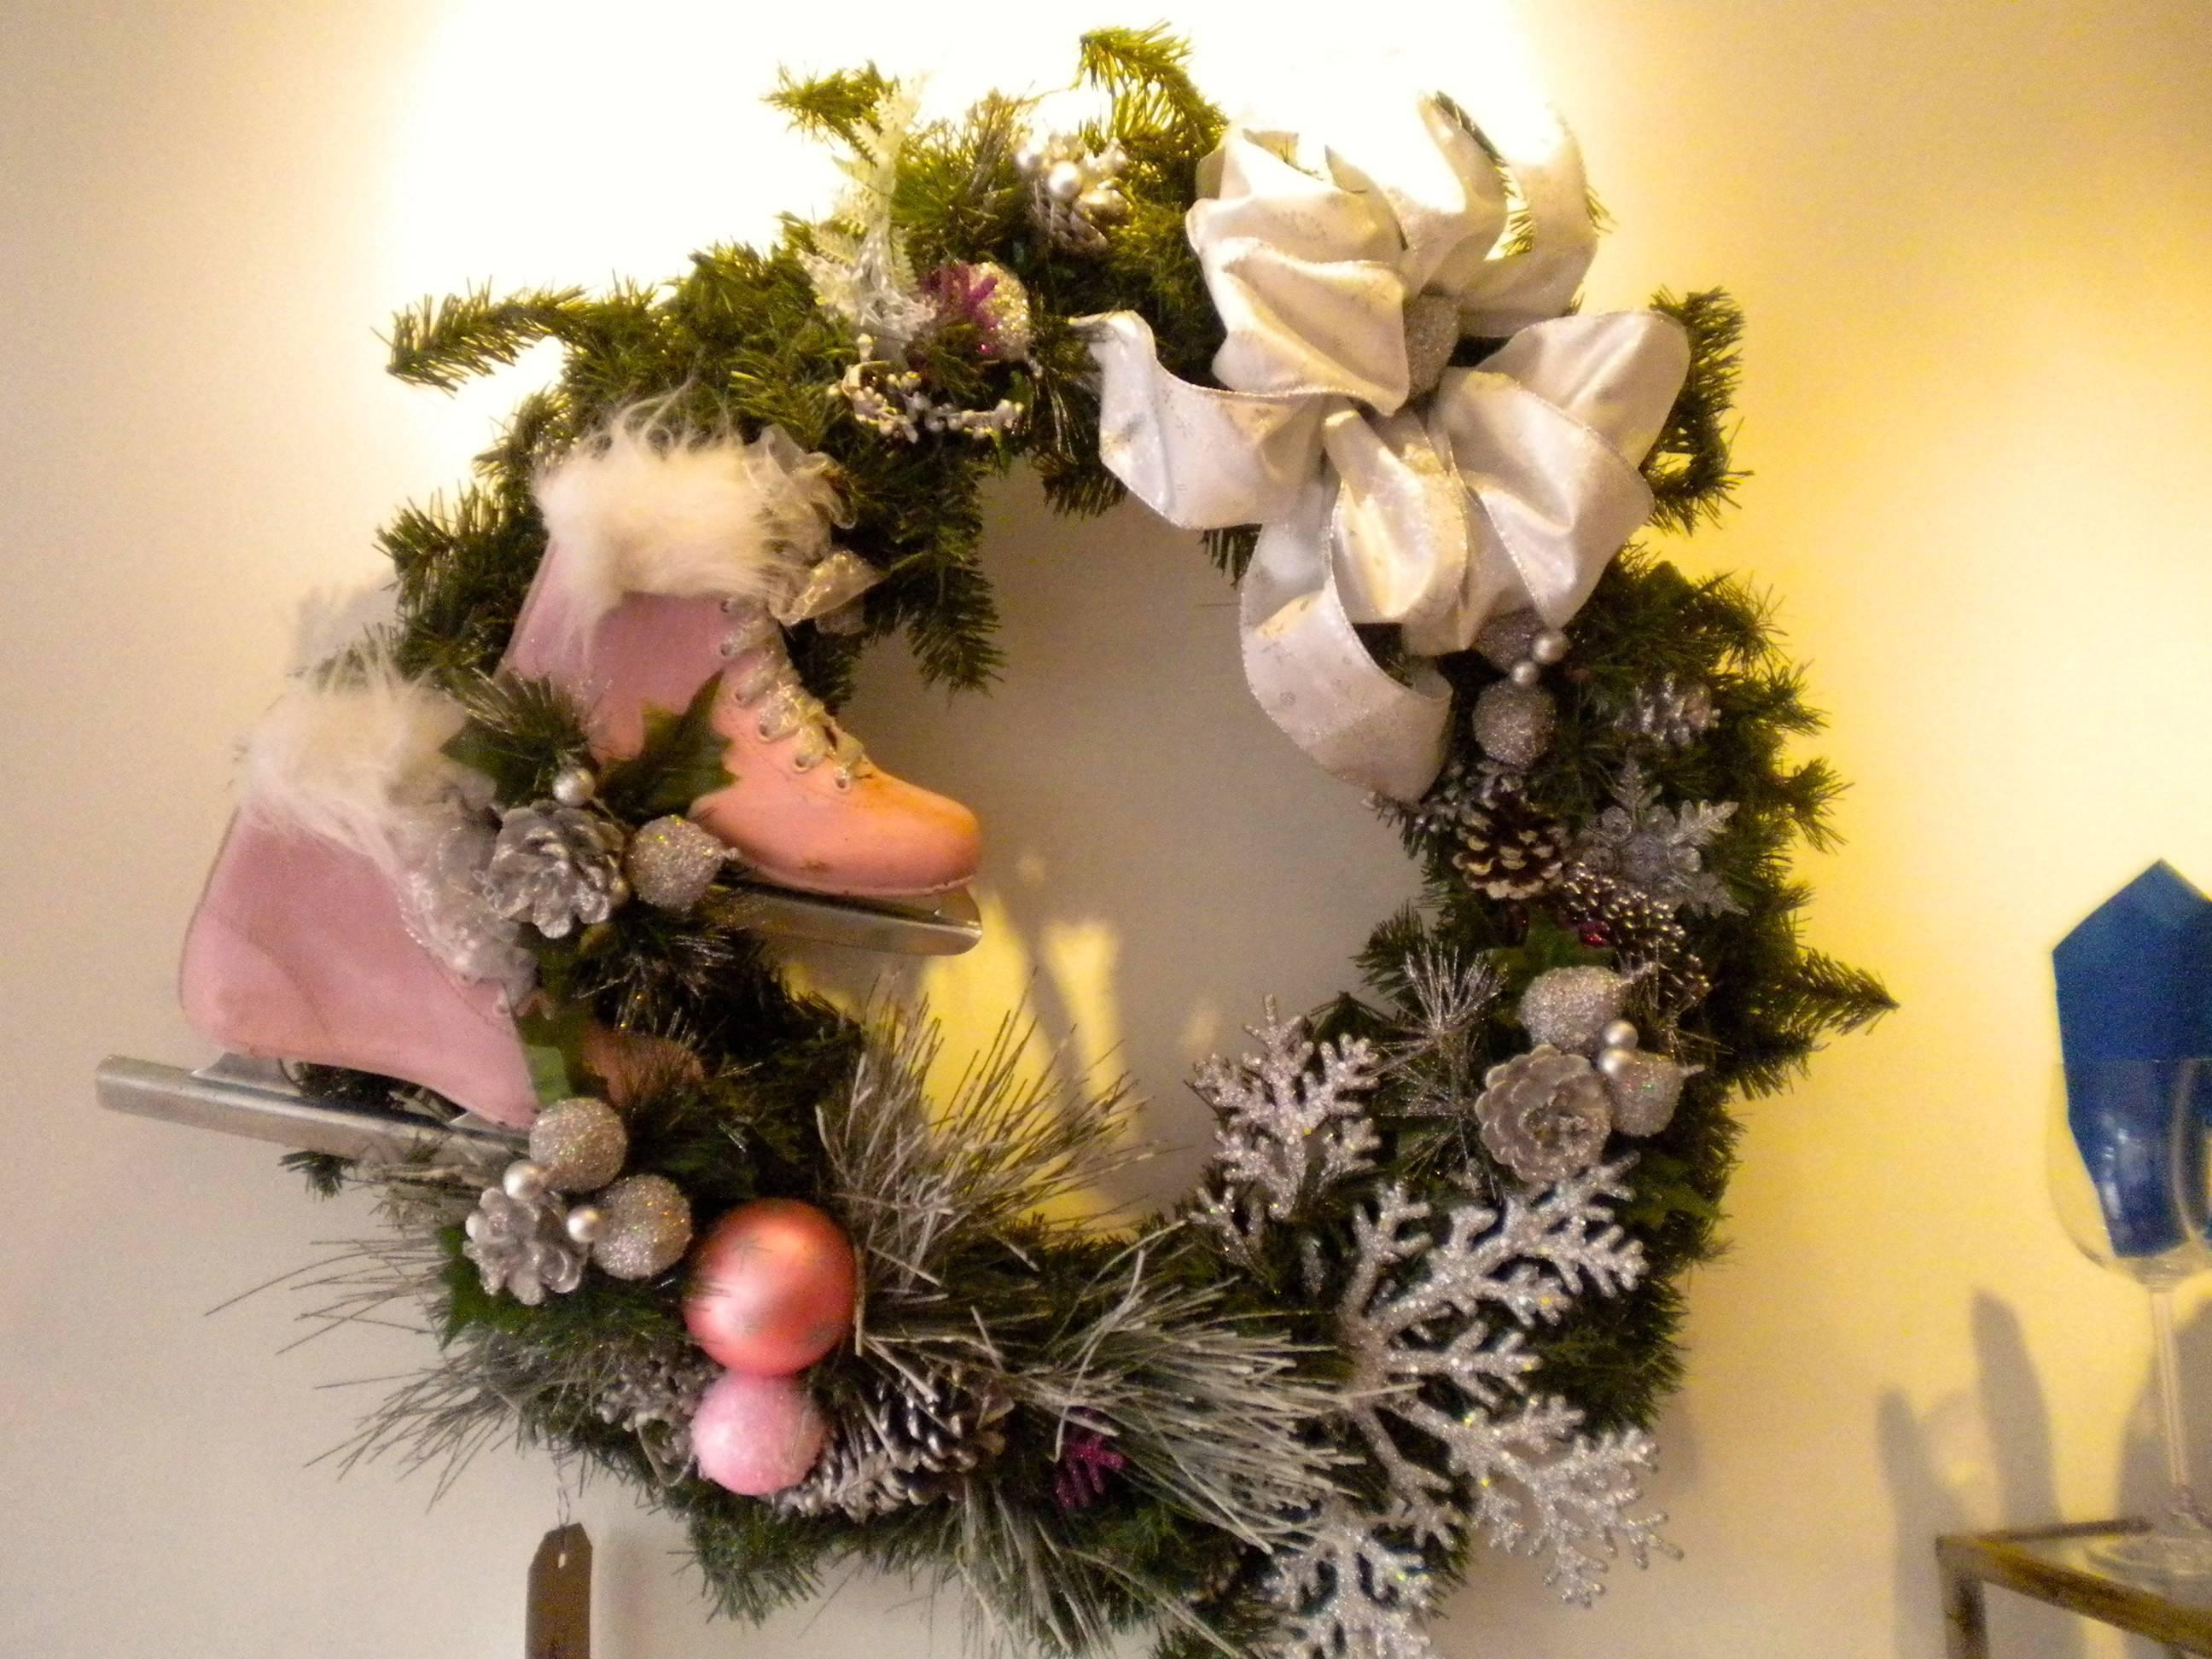 b5a1ca72de48e21e8b07_516e72e962e9aca5acb6_wreath.JPG